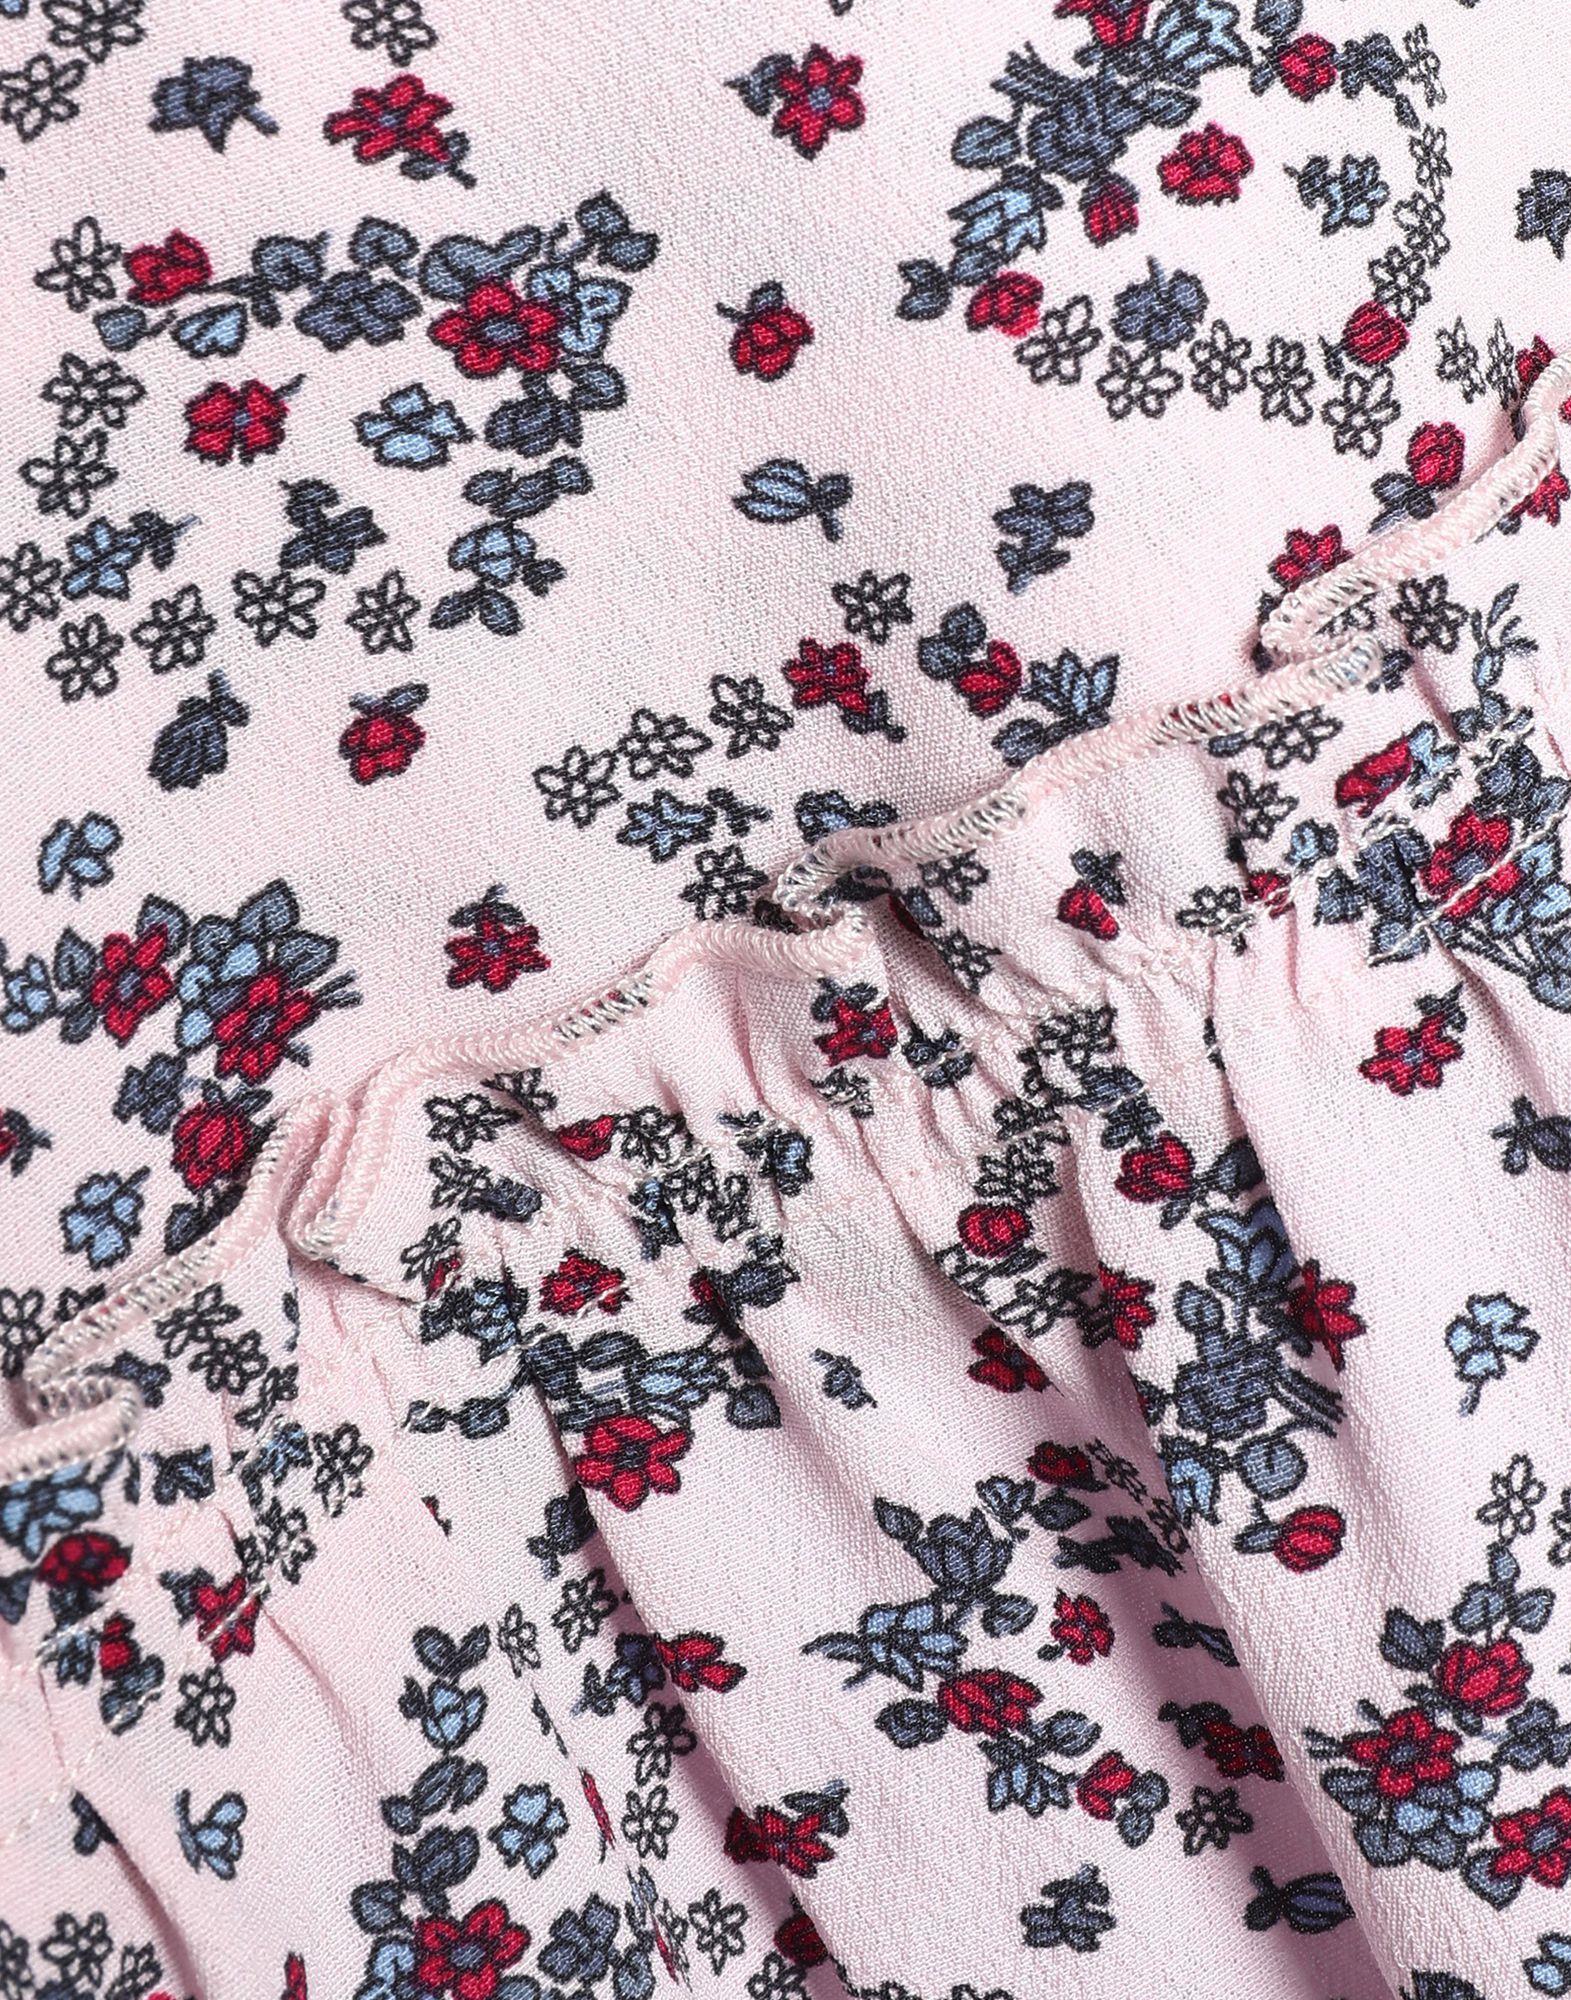 Claudie Pierlot Pink Floral Design Camisole